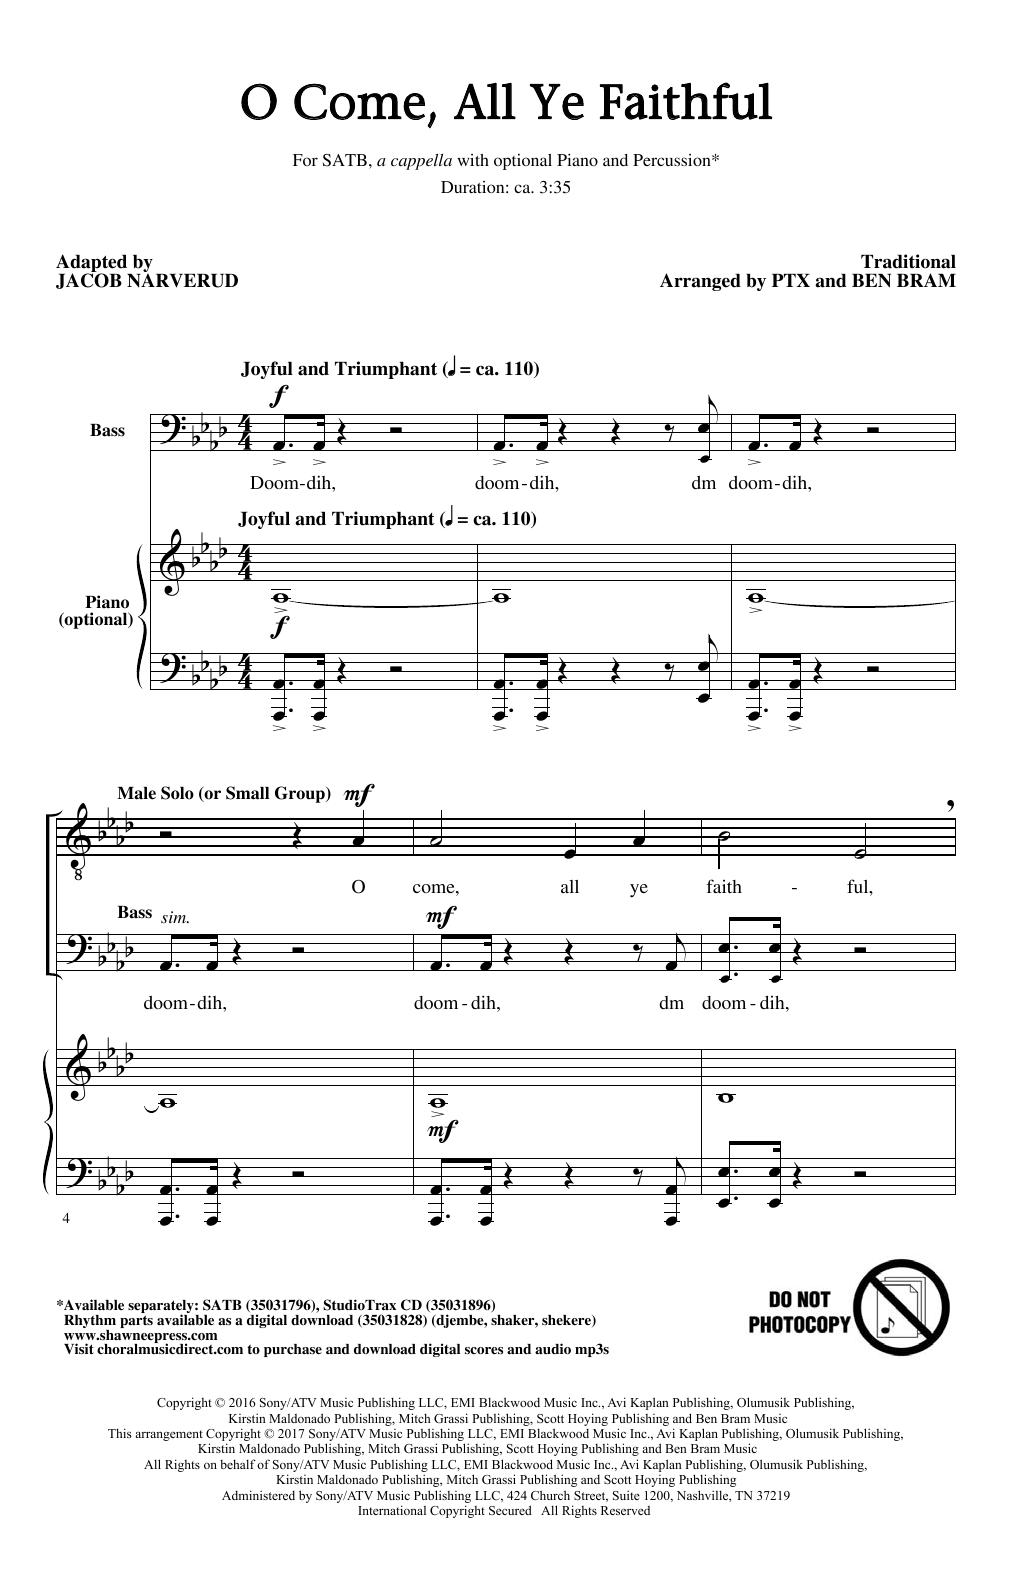 Jacob Narverud 'O Come, All Ye Faithful' Sheet Music, Notes & Chords